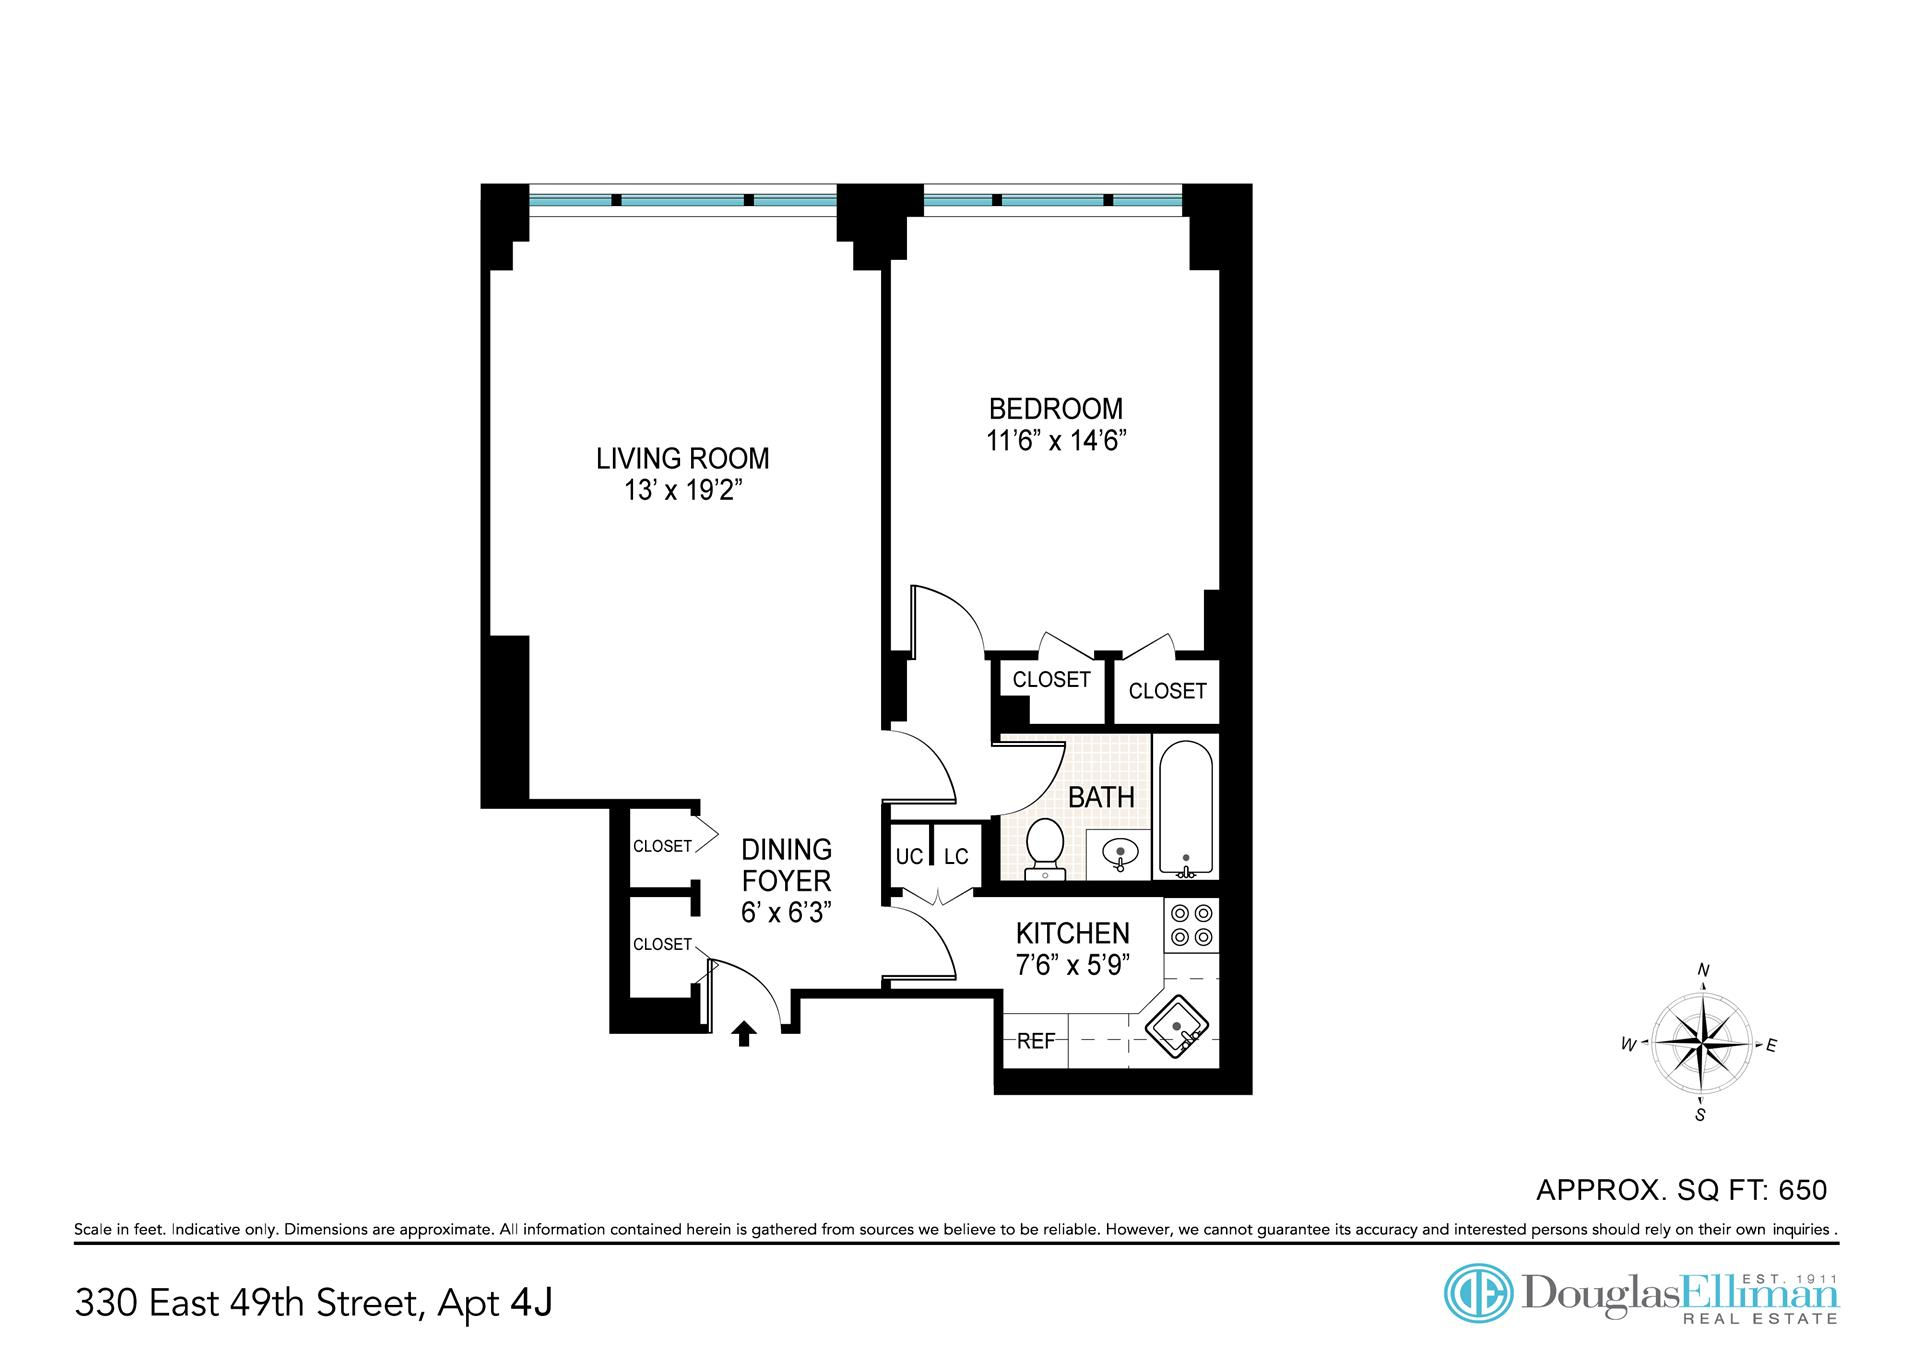 Floor plan of 330 East 49th St, 4J - Turtle Bay, New York